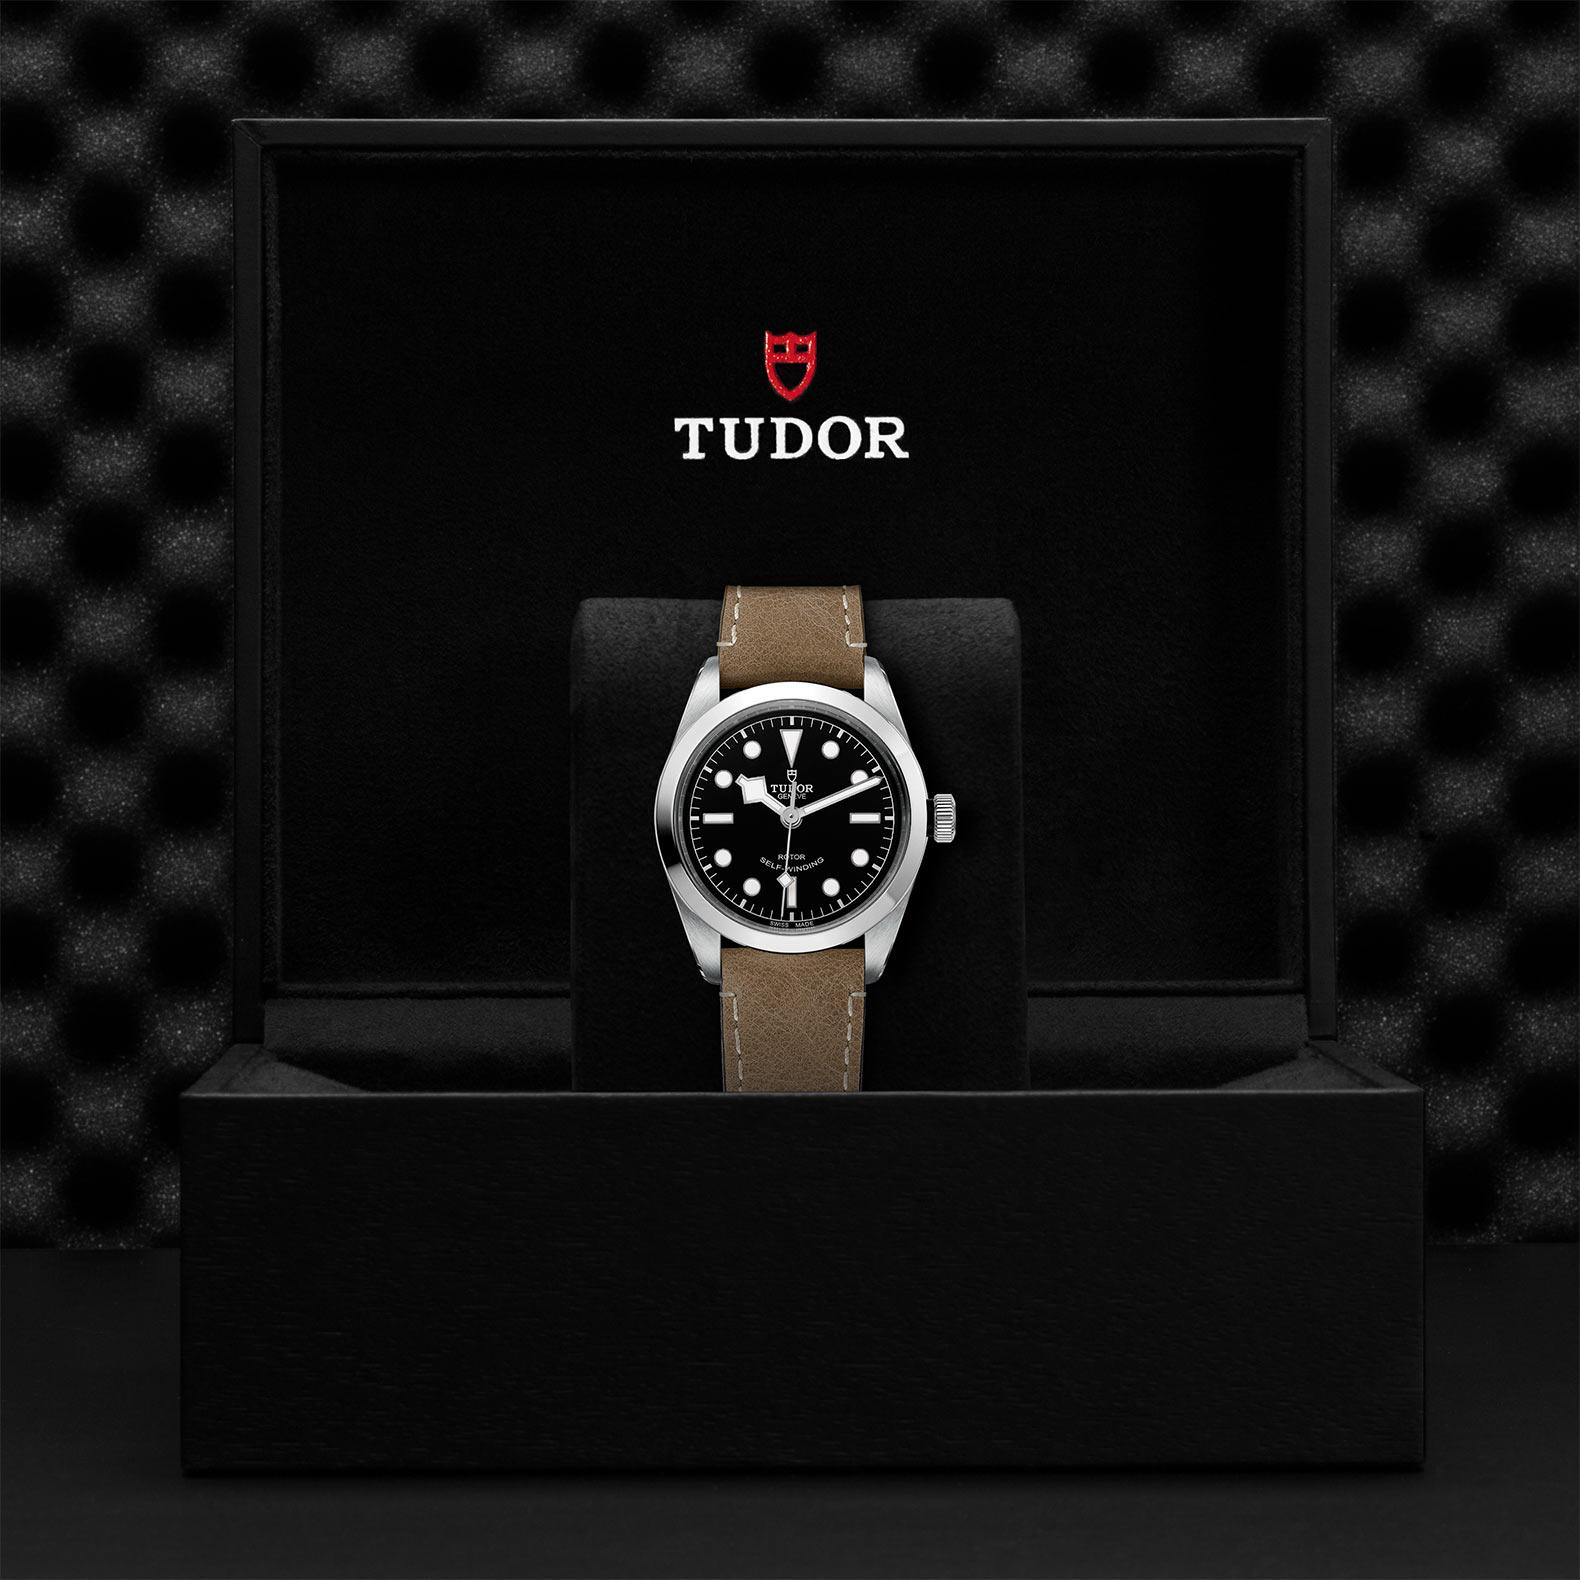 TUDOR Black Bay 36 M79500 0008 Presentation